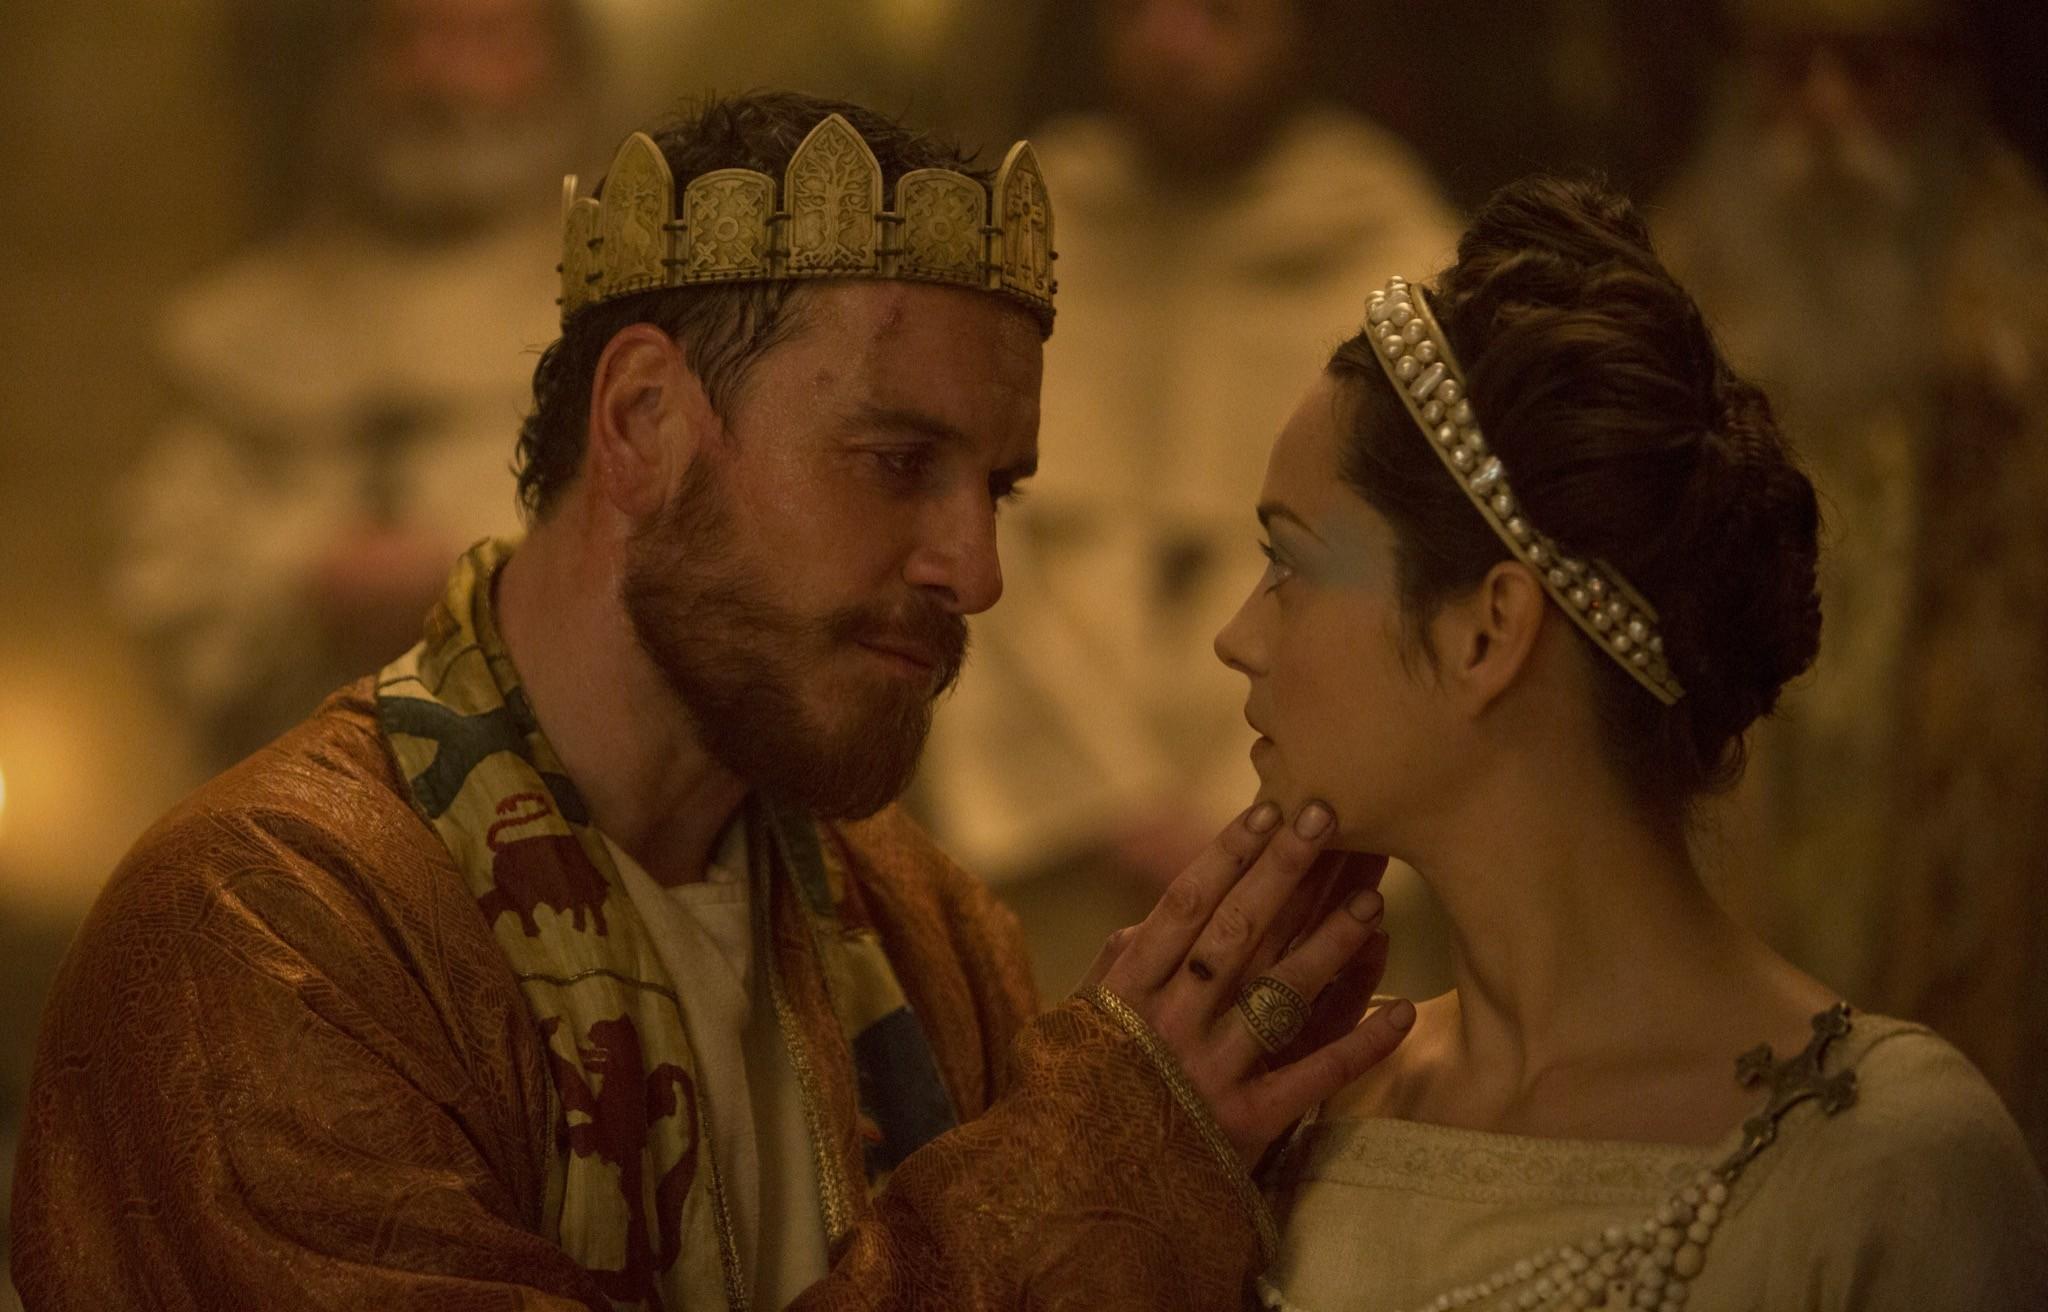 Macbeth-image-4